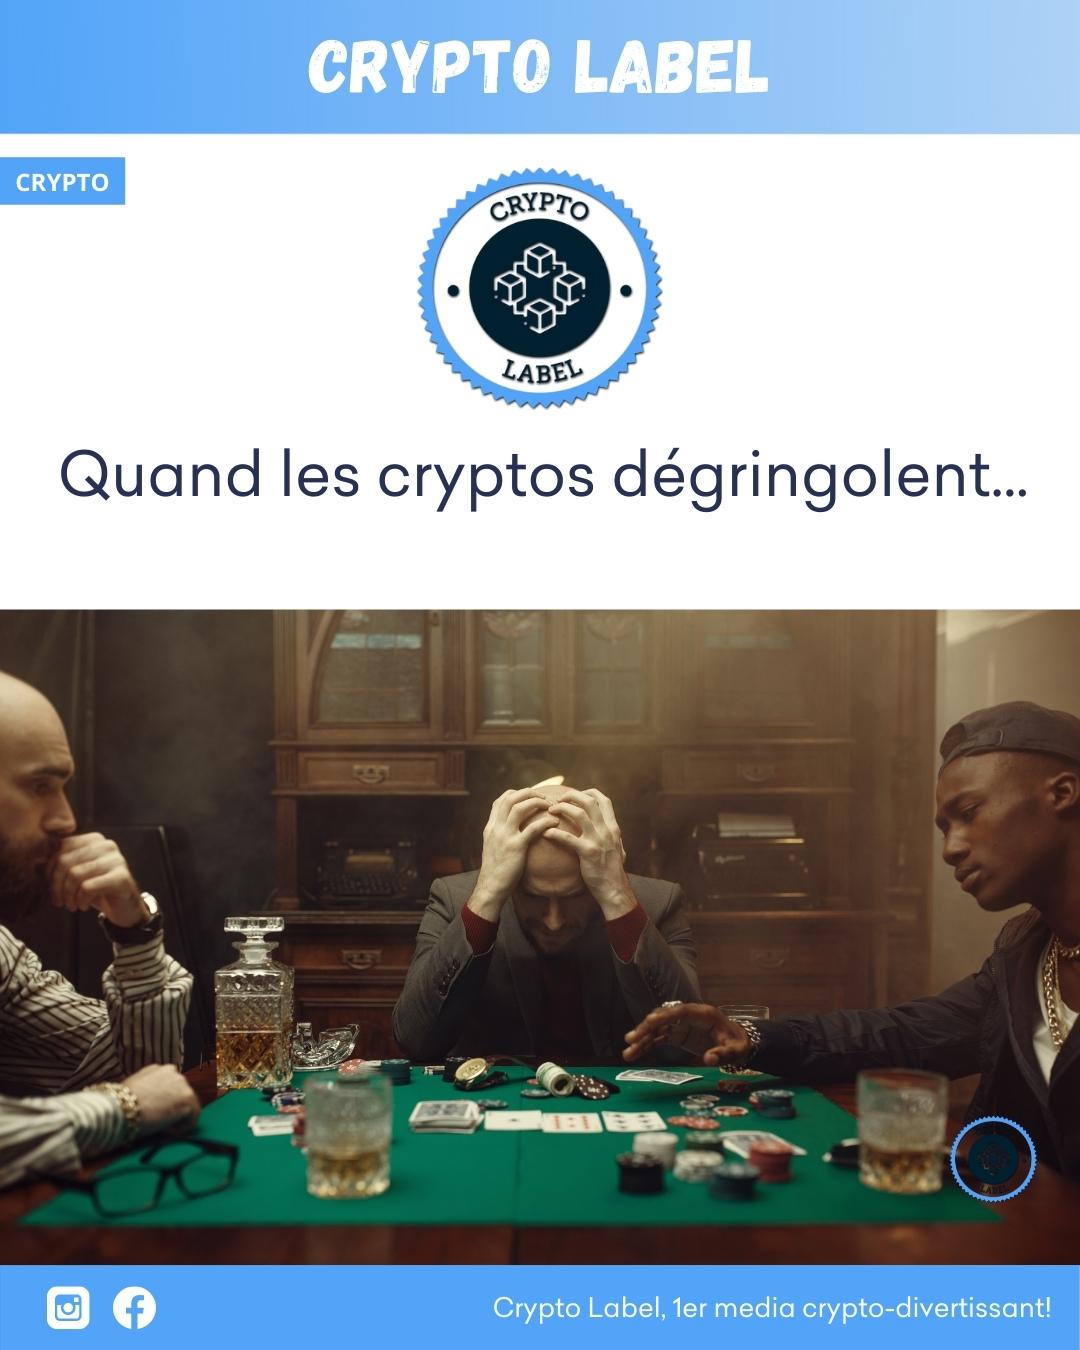 MEME Chute-crypto-label